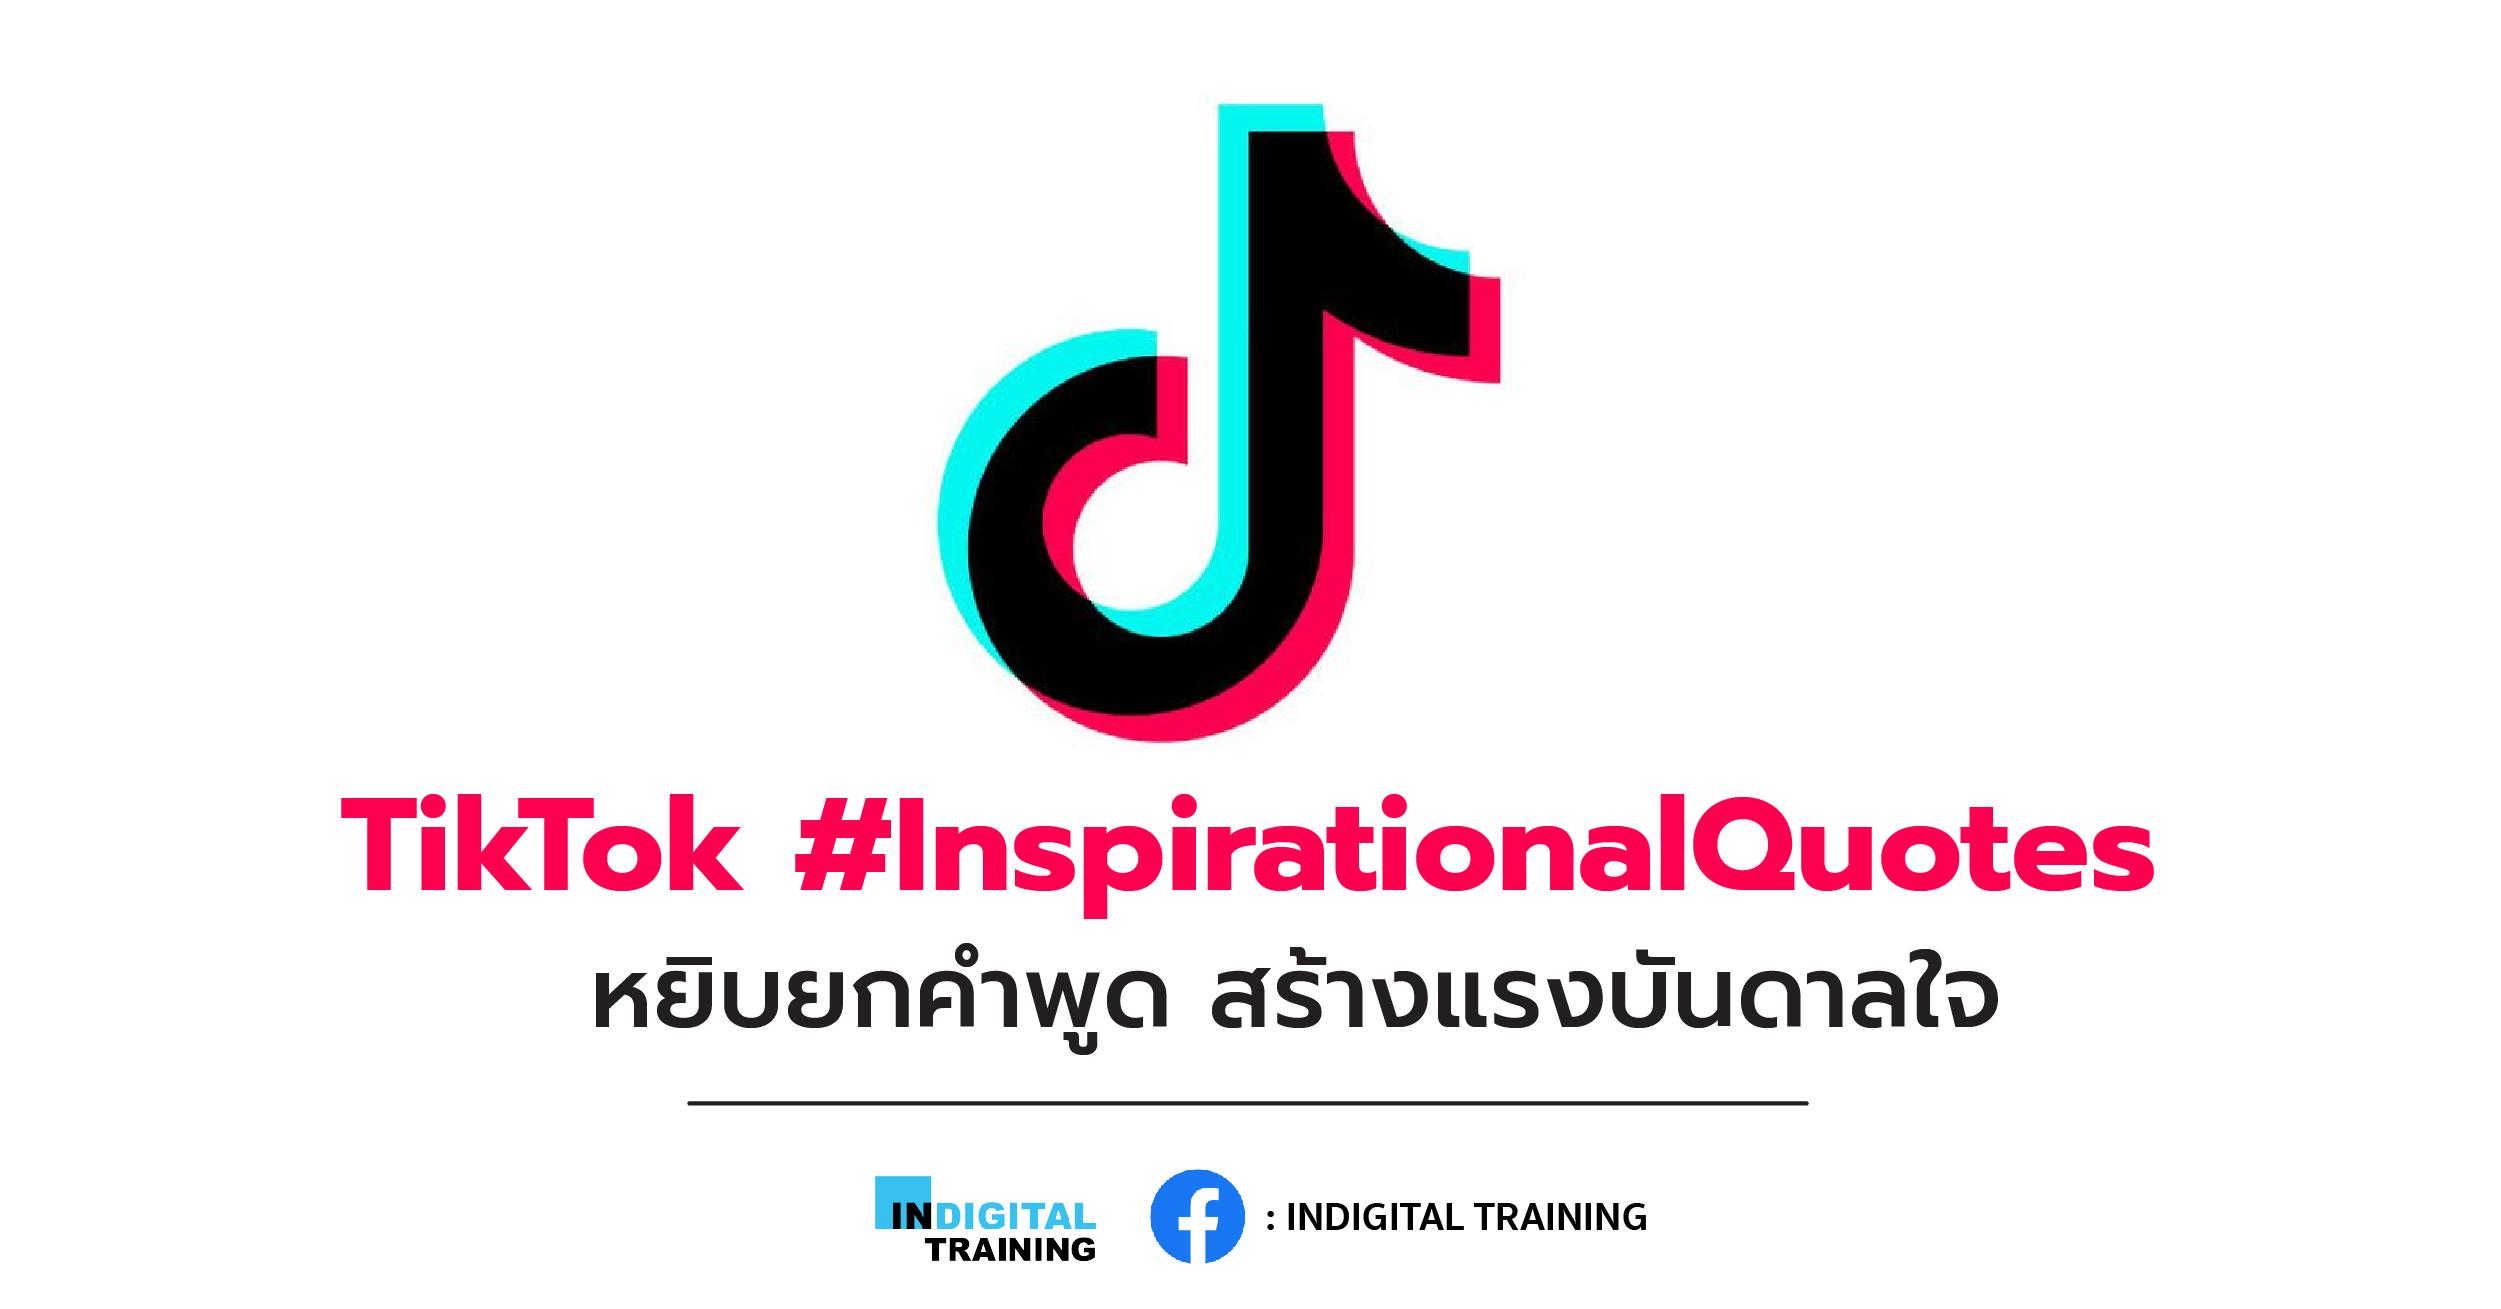 TikTok #InspirationalQuotes หยิบยกทุกคำพูด สร้างแรงบันดาลใจ